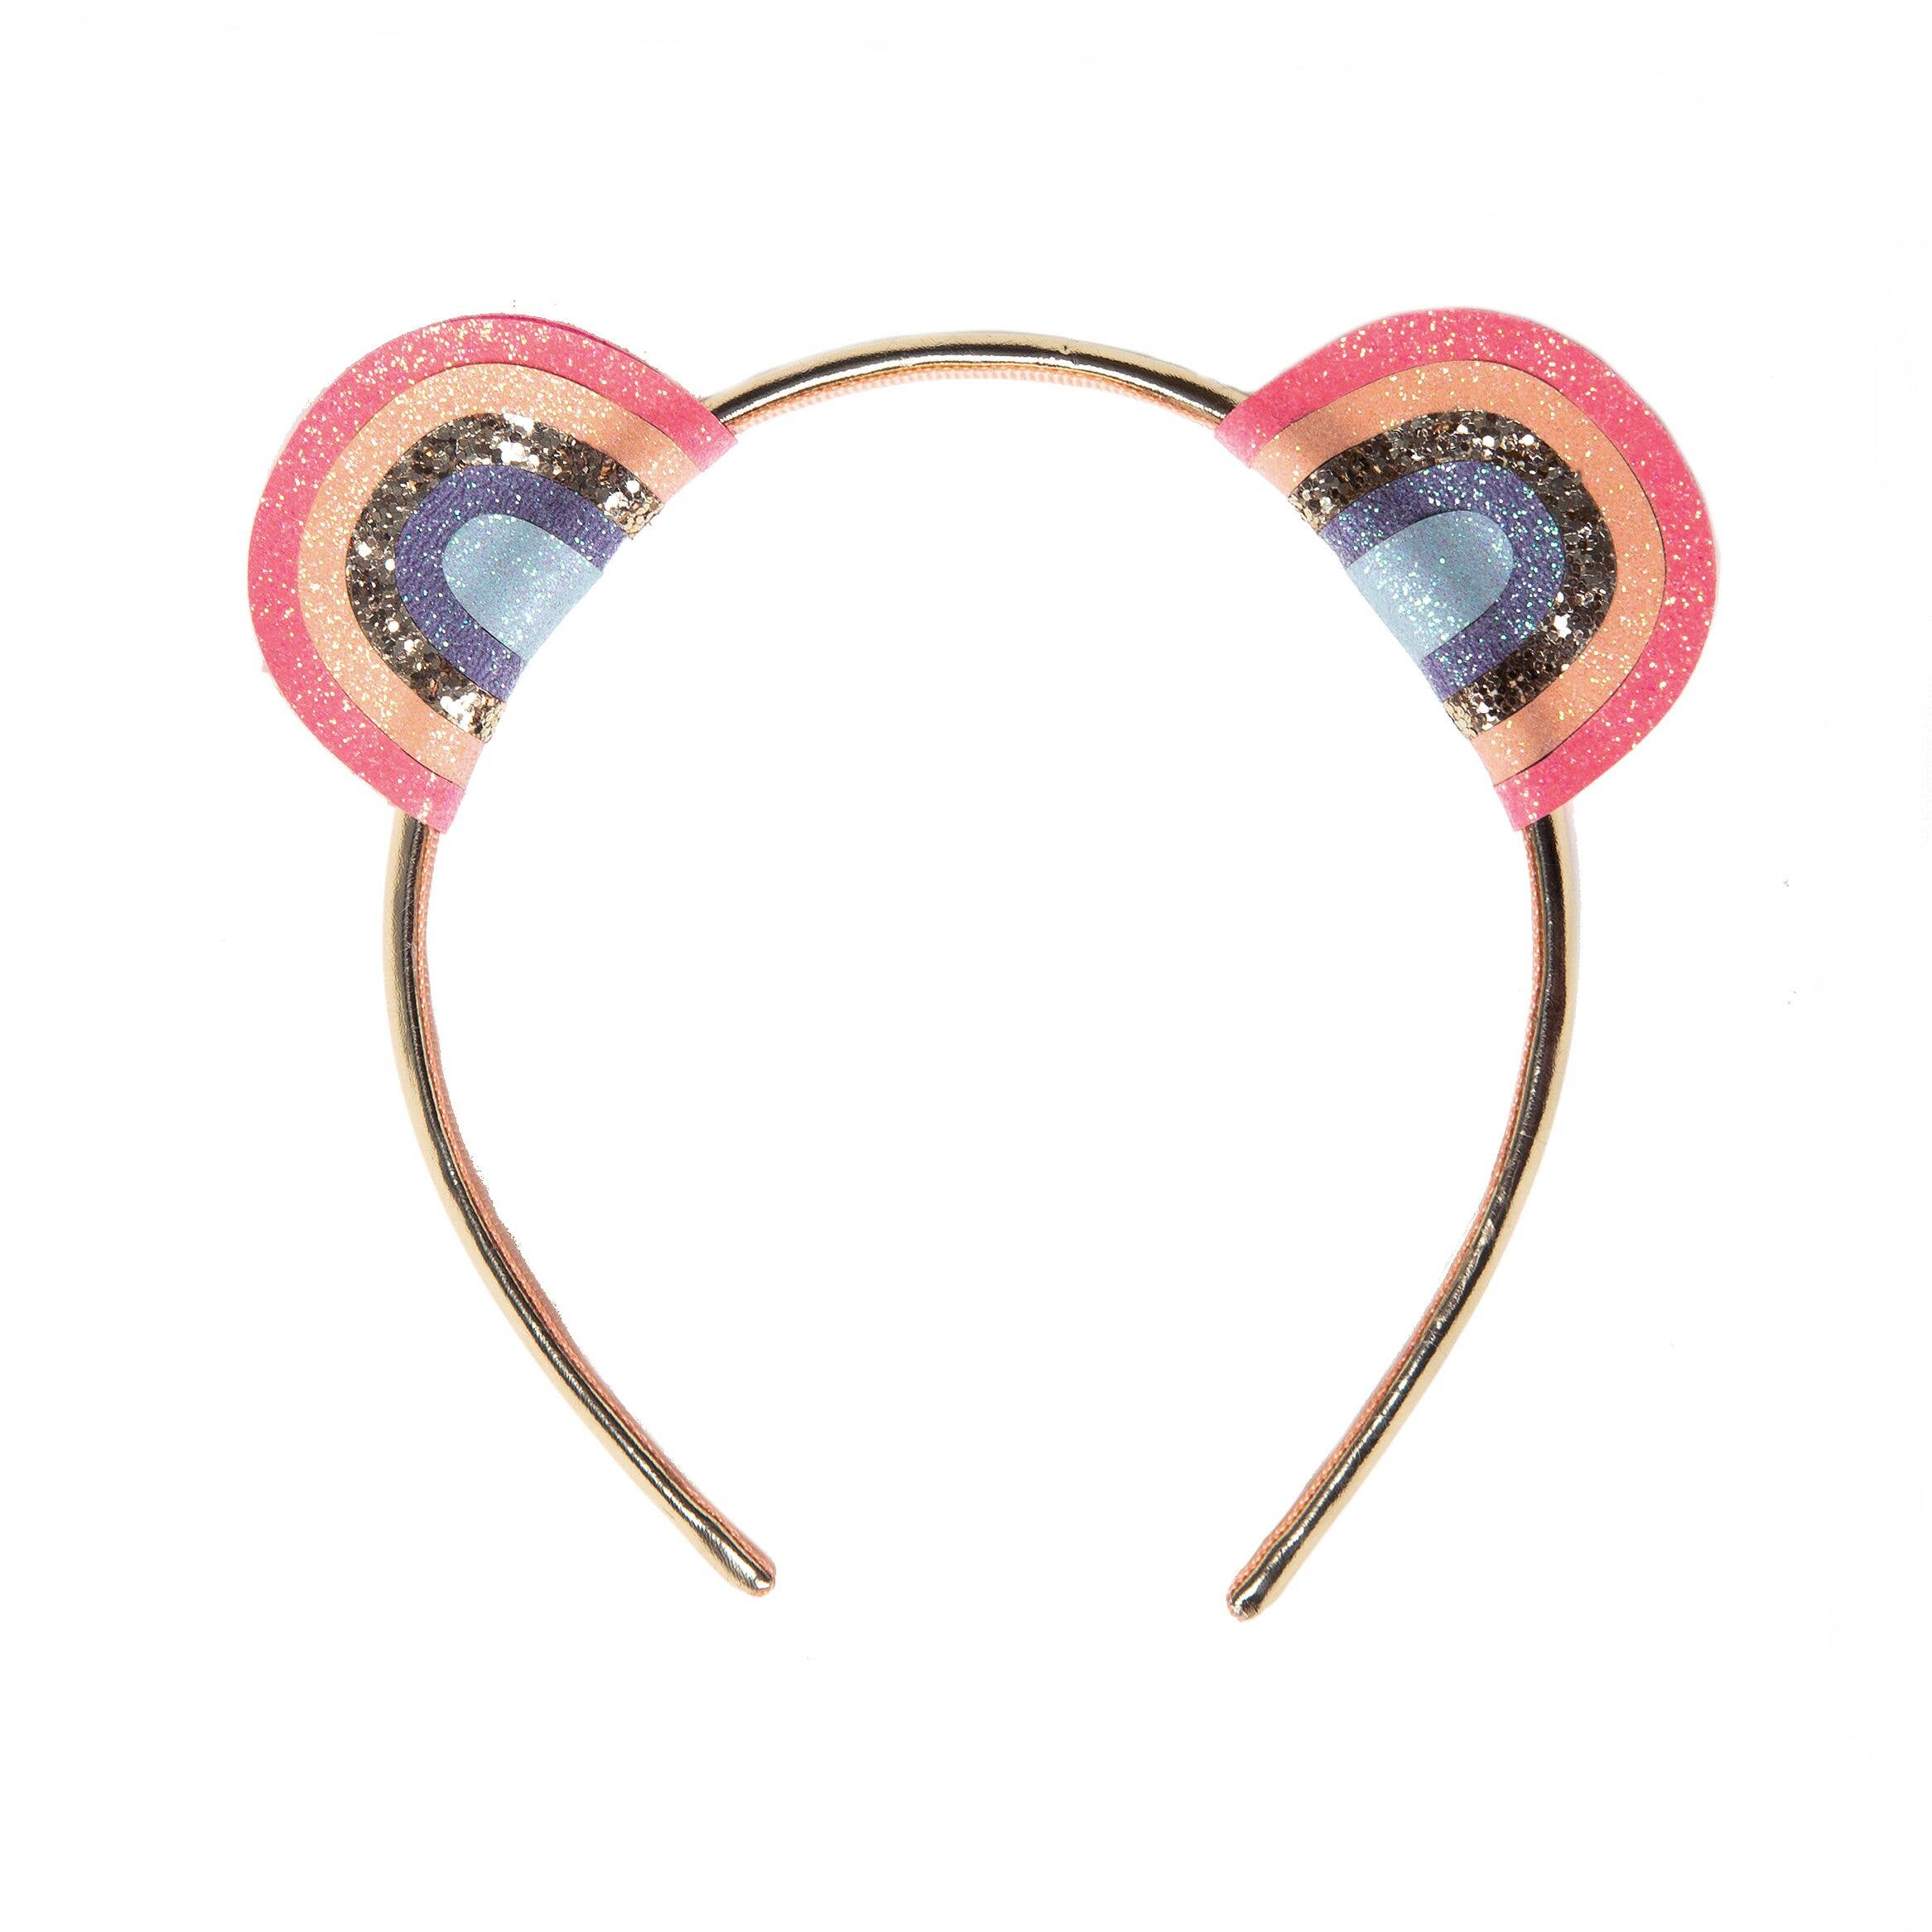 Cheetah Costume GLITTER HEADBAND Glittery Sparkly Stretch Headband Bling SPARKLE